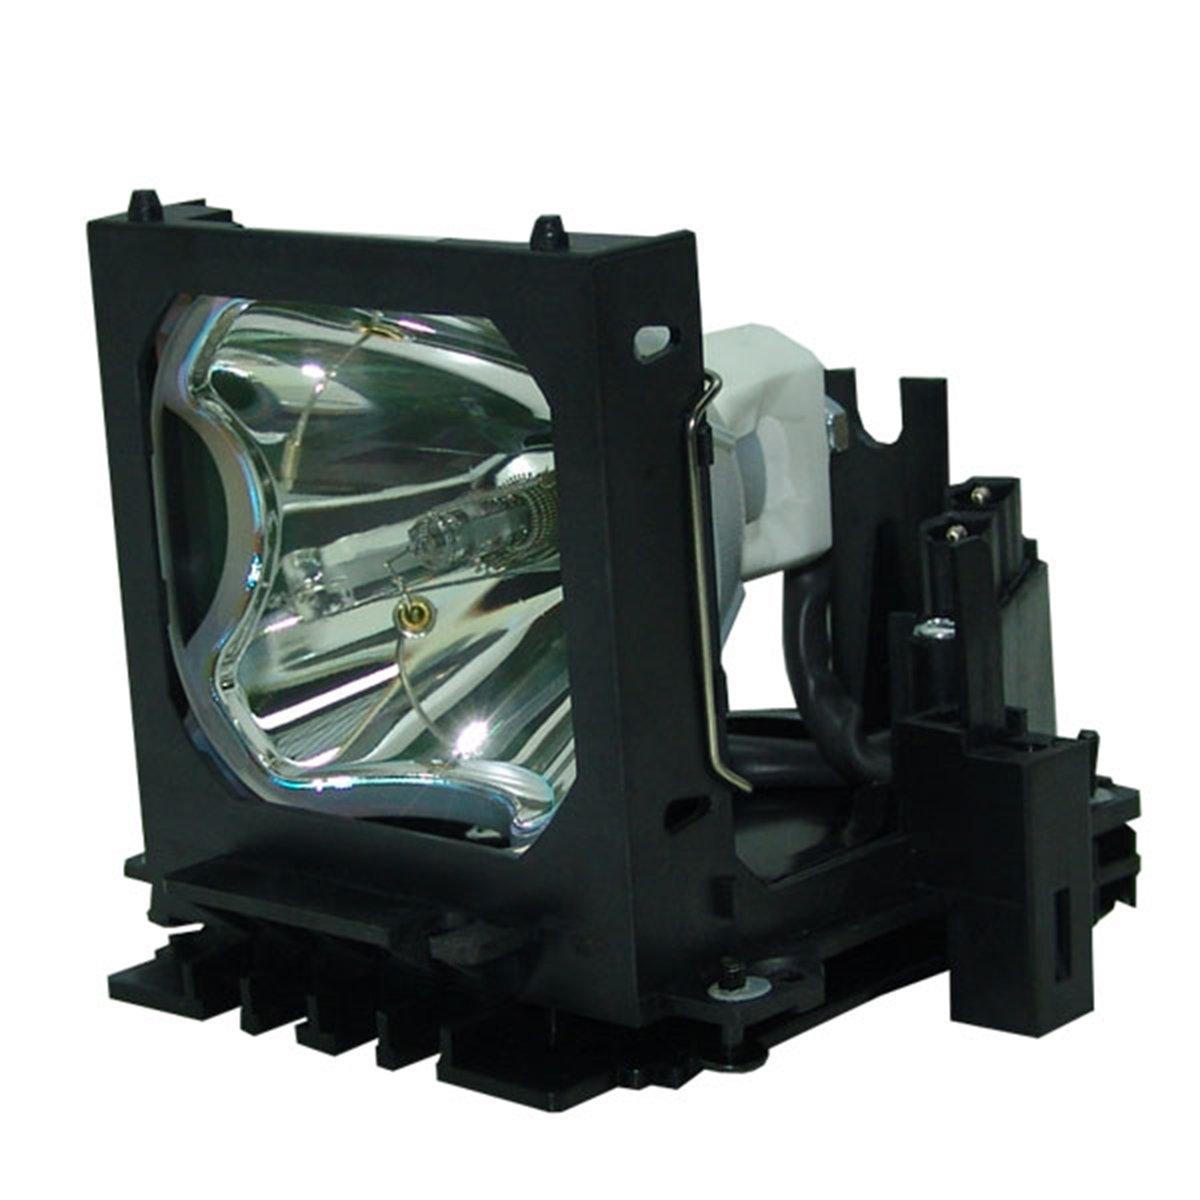 SpArc OEMプロジェクター交換用ランプ 囲い/電球付き 3M MP8790用 Economy B07MPSJTTC Lamp with Housing Economy